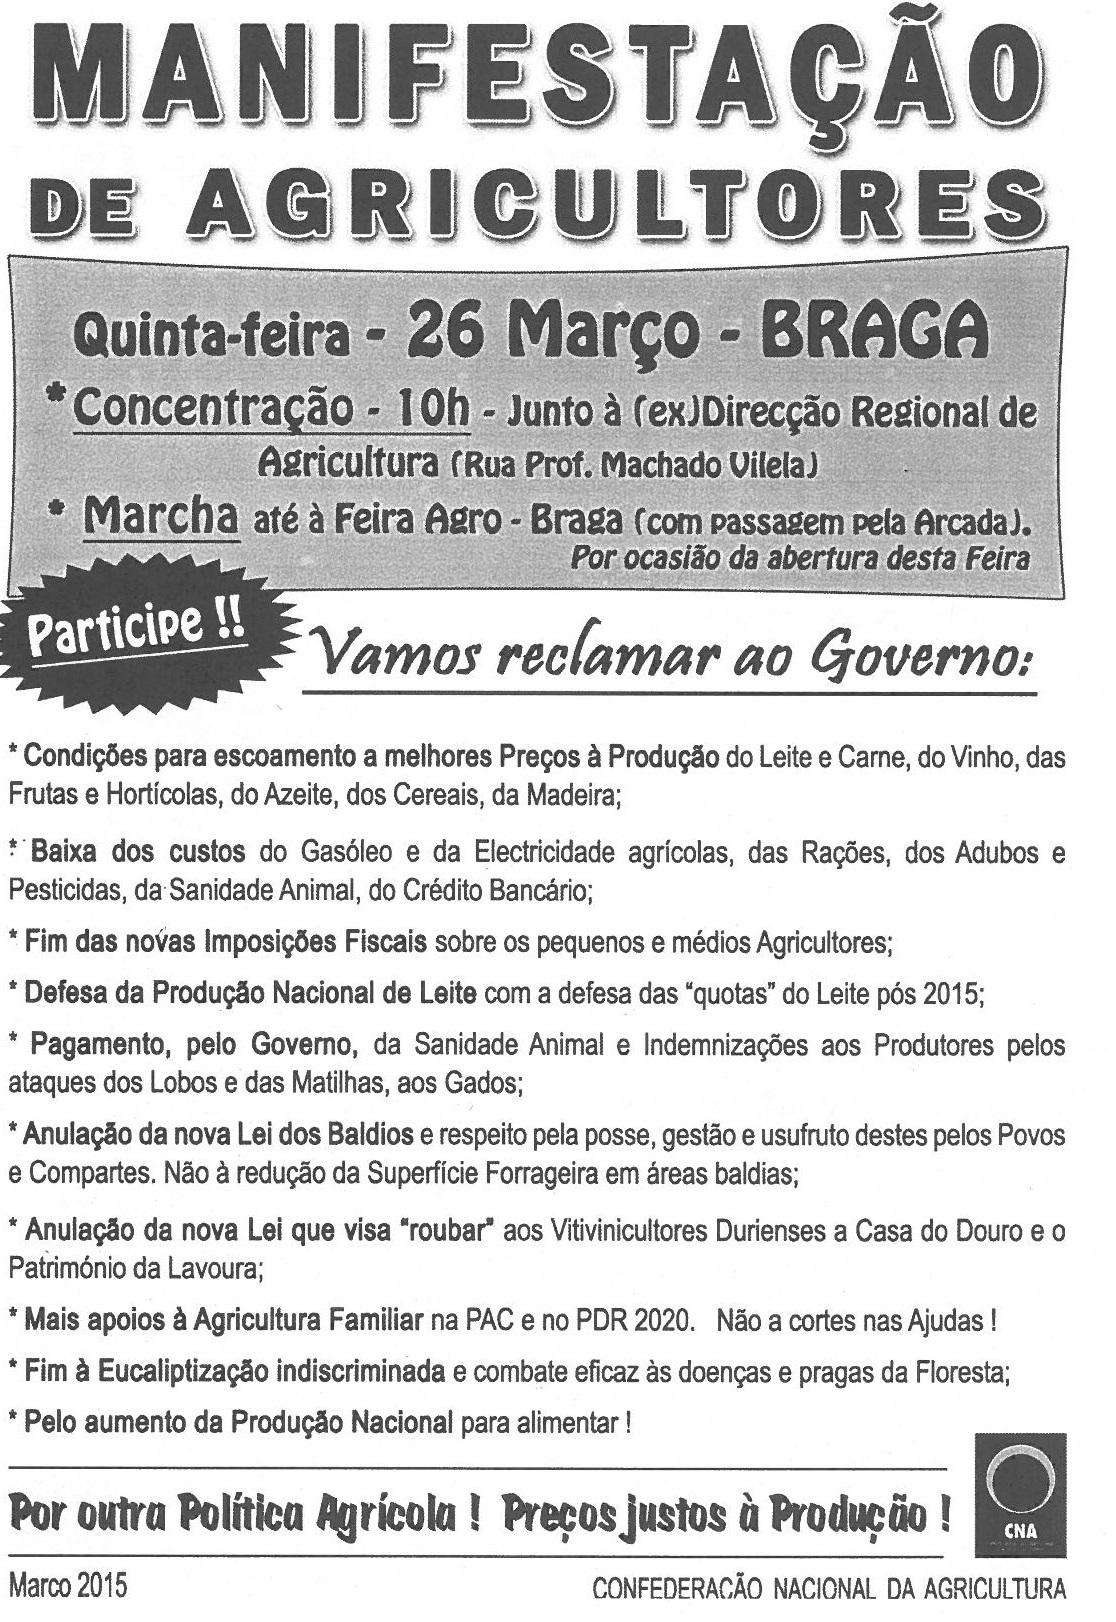 Manif Braga 2015-03-26 1